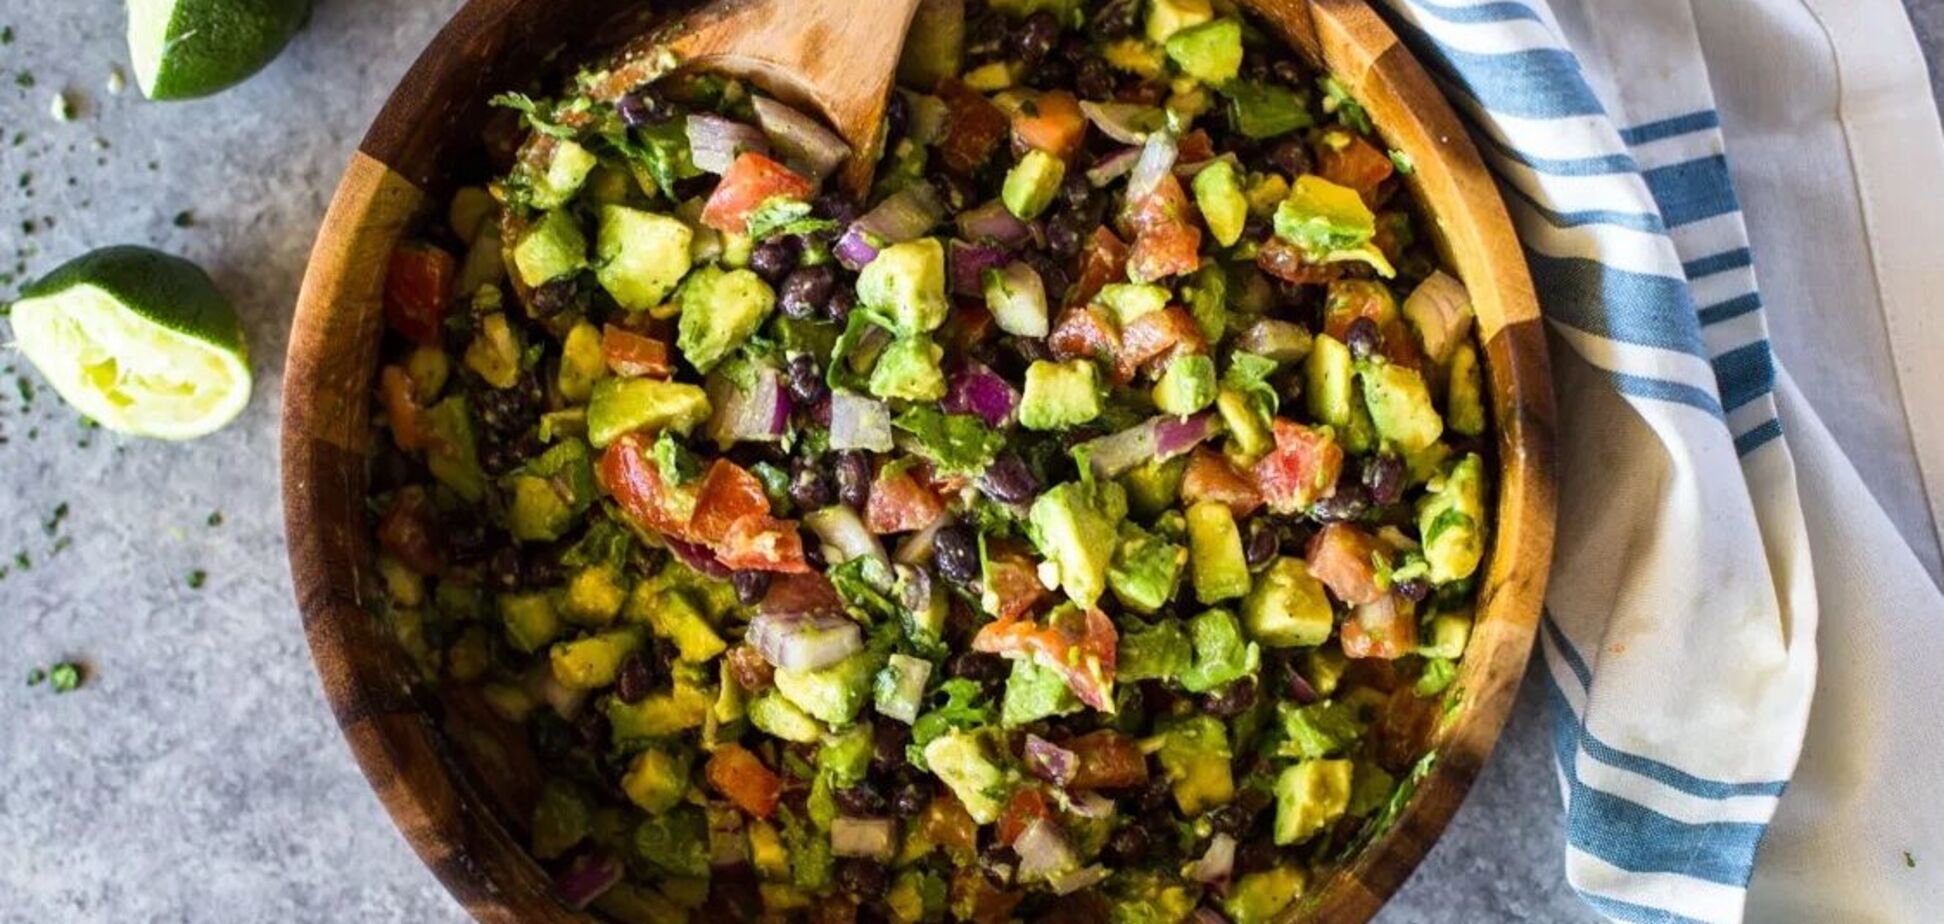 салат із квасолею та авокадо